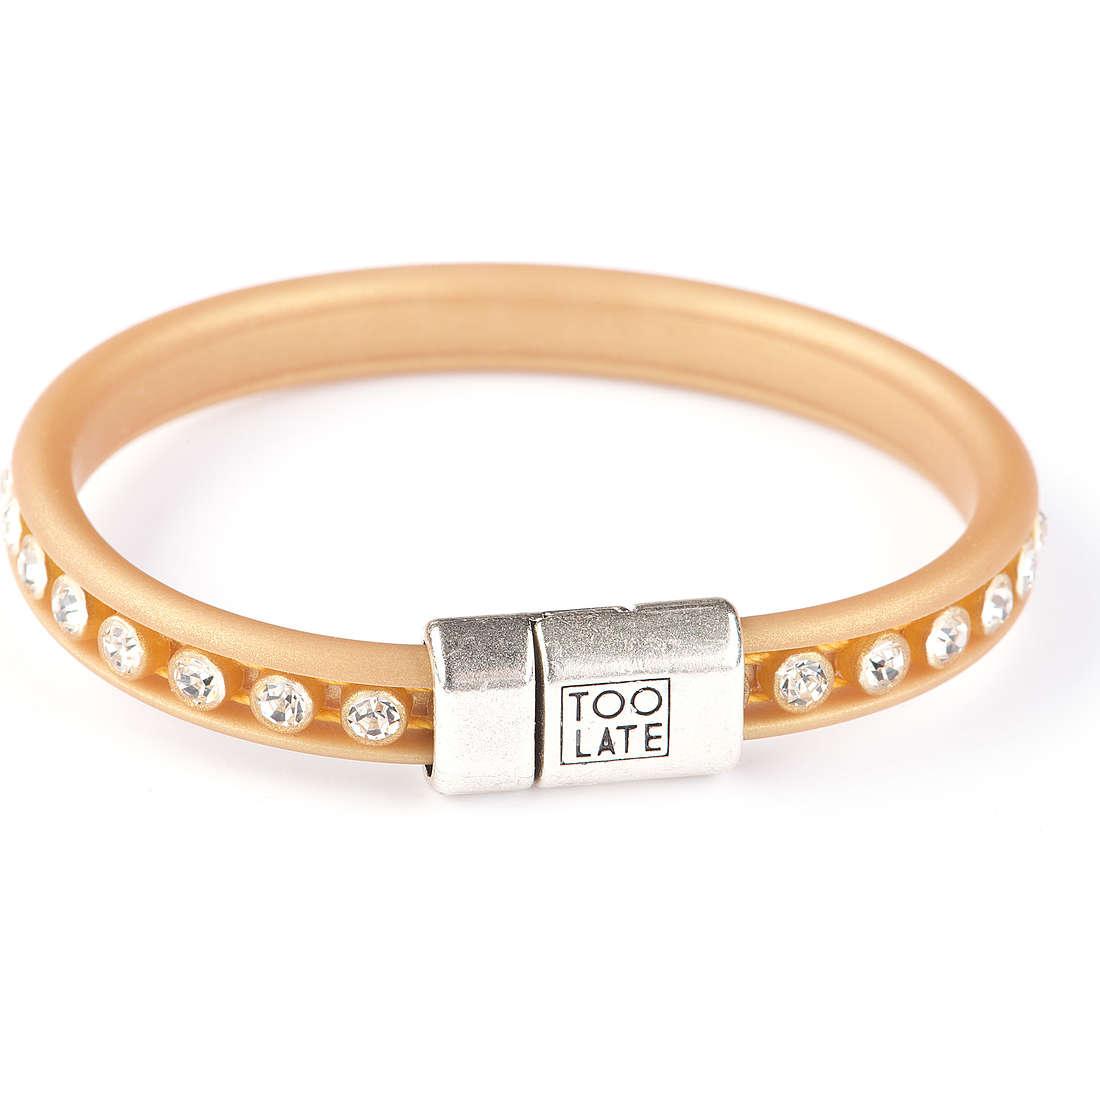 bracelet woman jewellery Too late 8052745222287